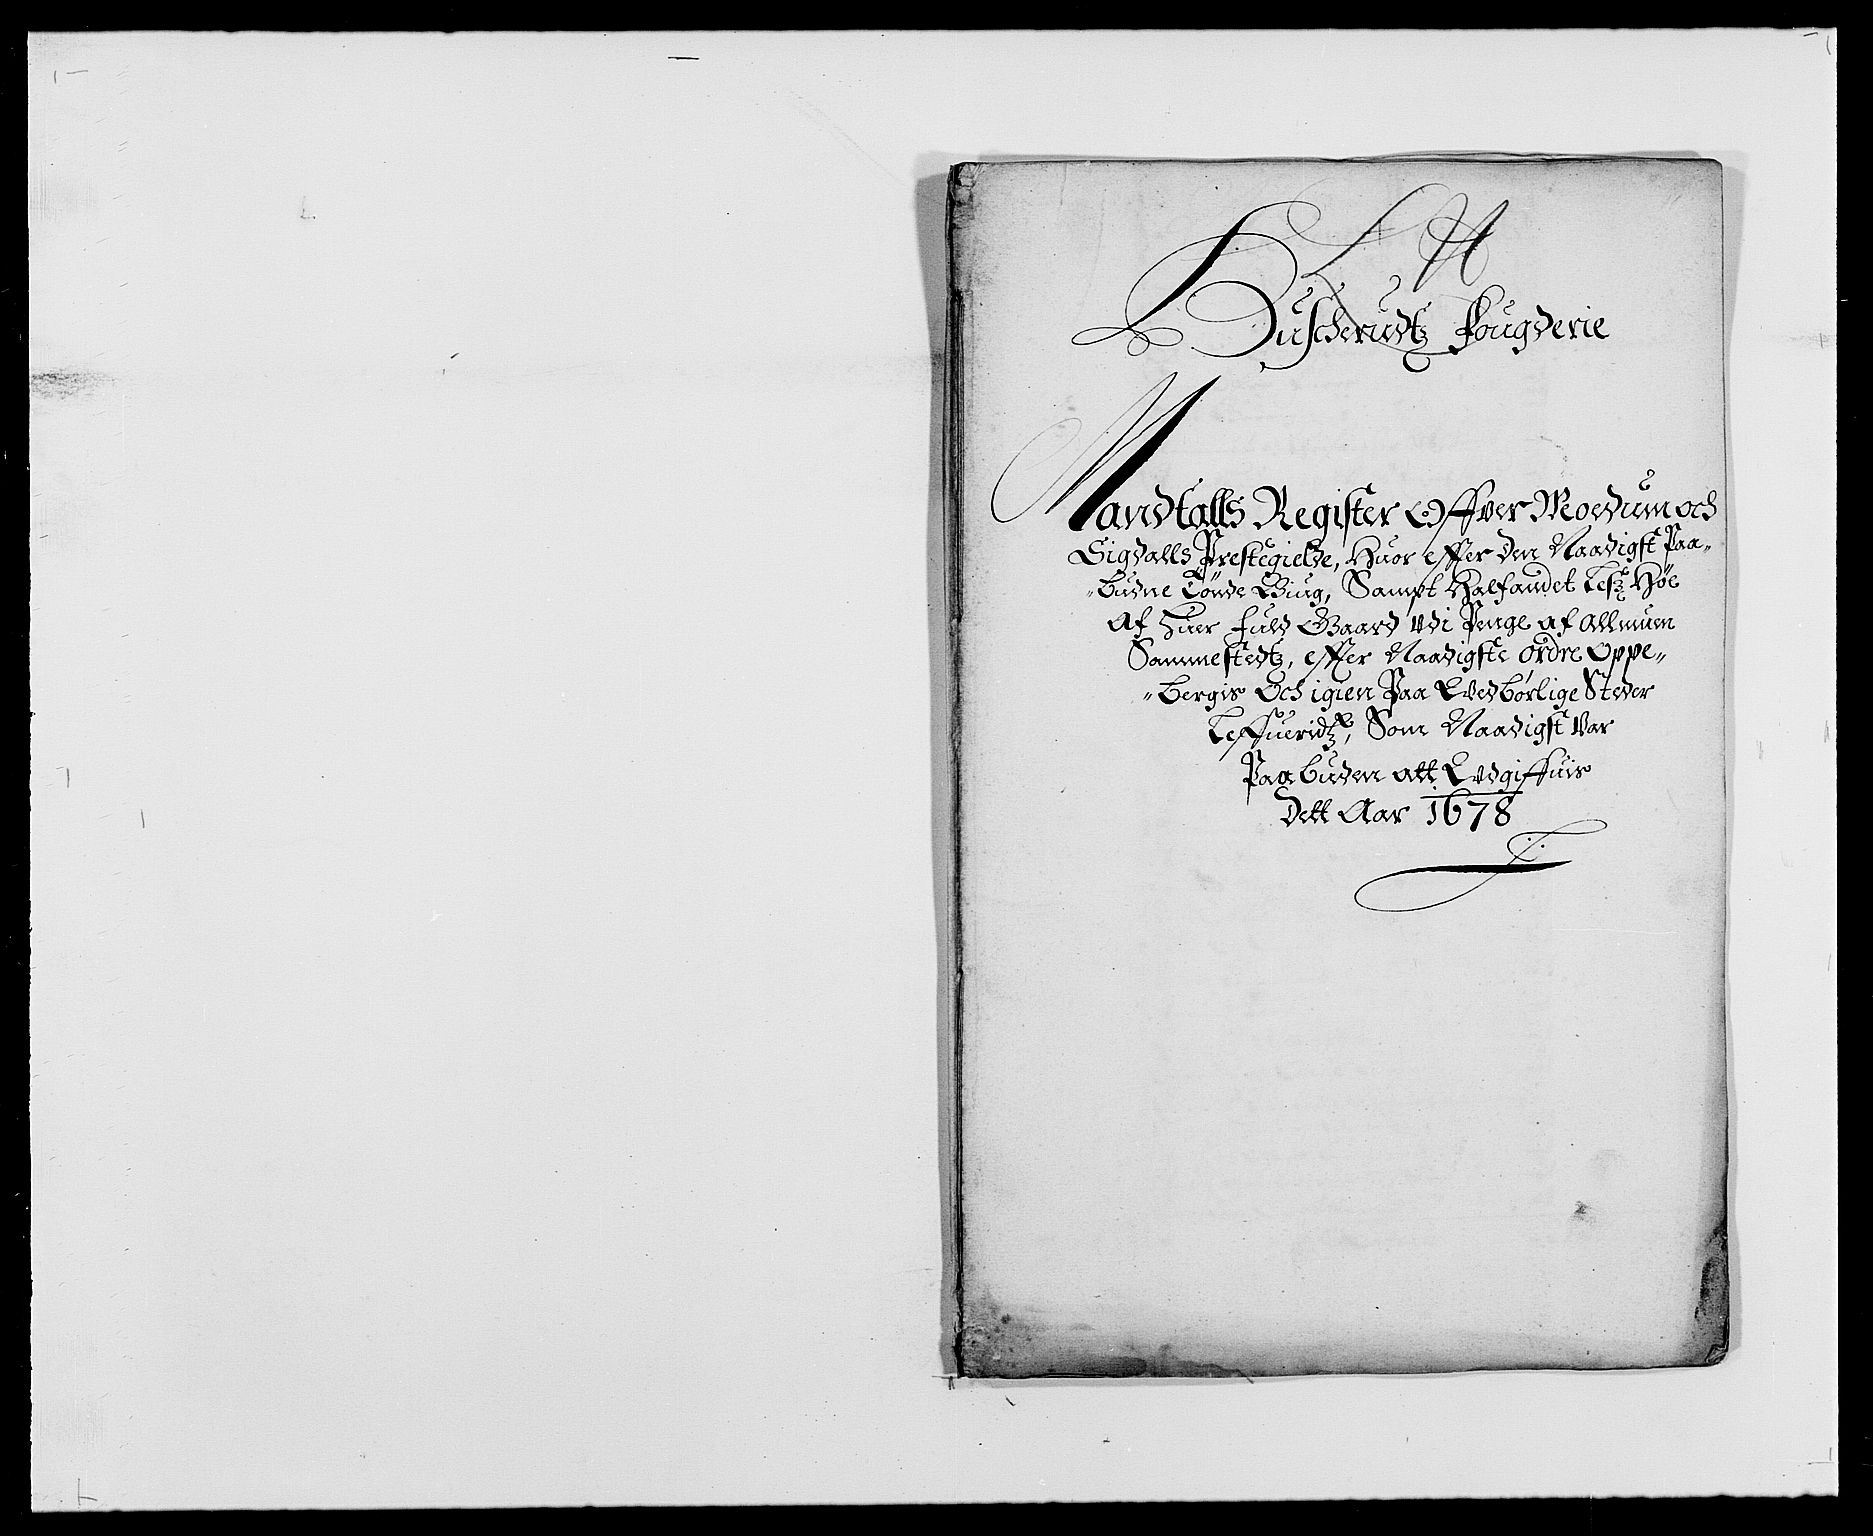 RA, Rentekammeret inntil 1814, Reviderte regnskaper, Fogderegnskap, R25/L1674: Fogderegnskap Buskerud, 1678-1681, s. 154